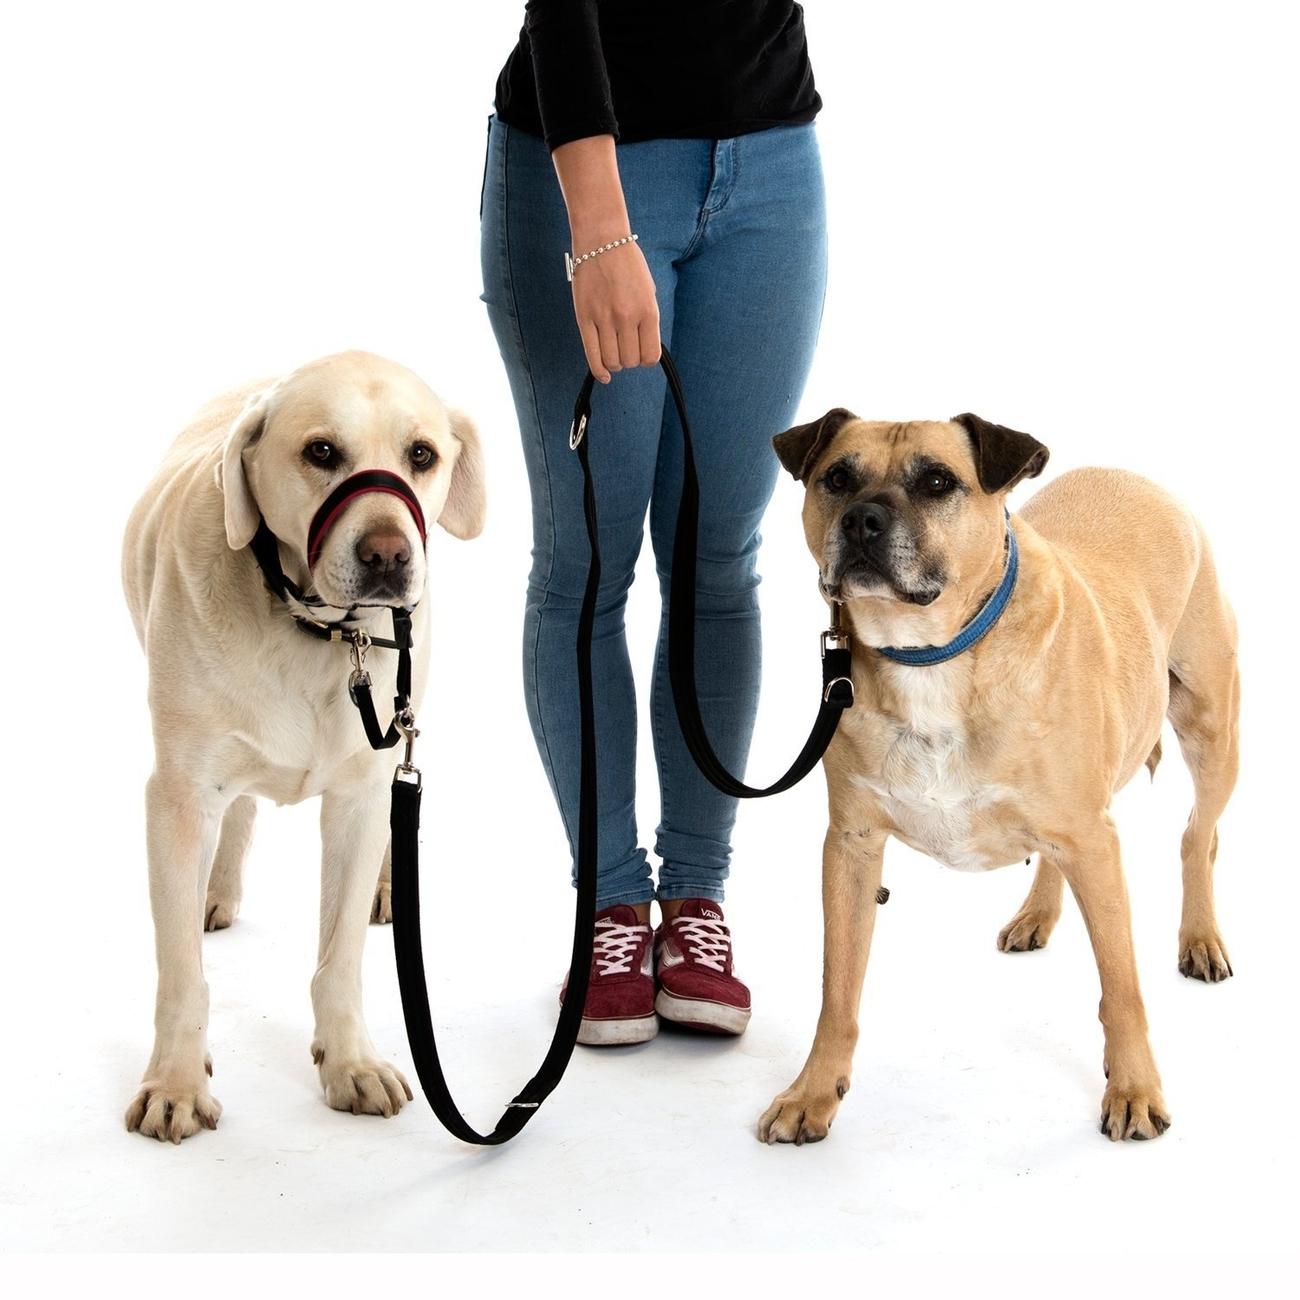 Company of Animals Halti Leine Training Lead, Bild 7